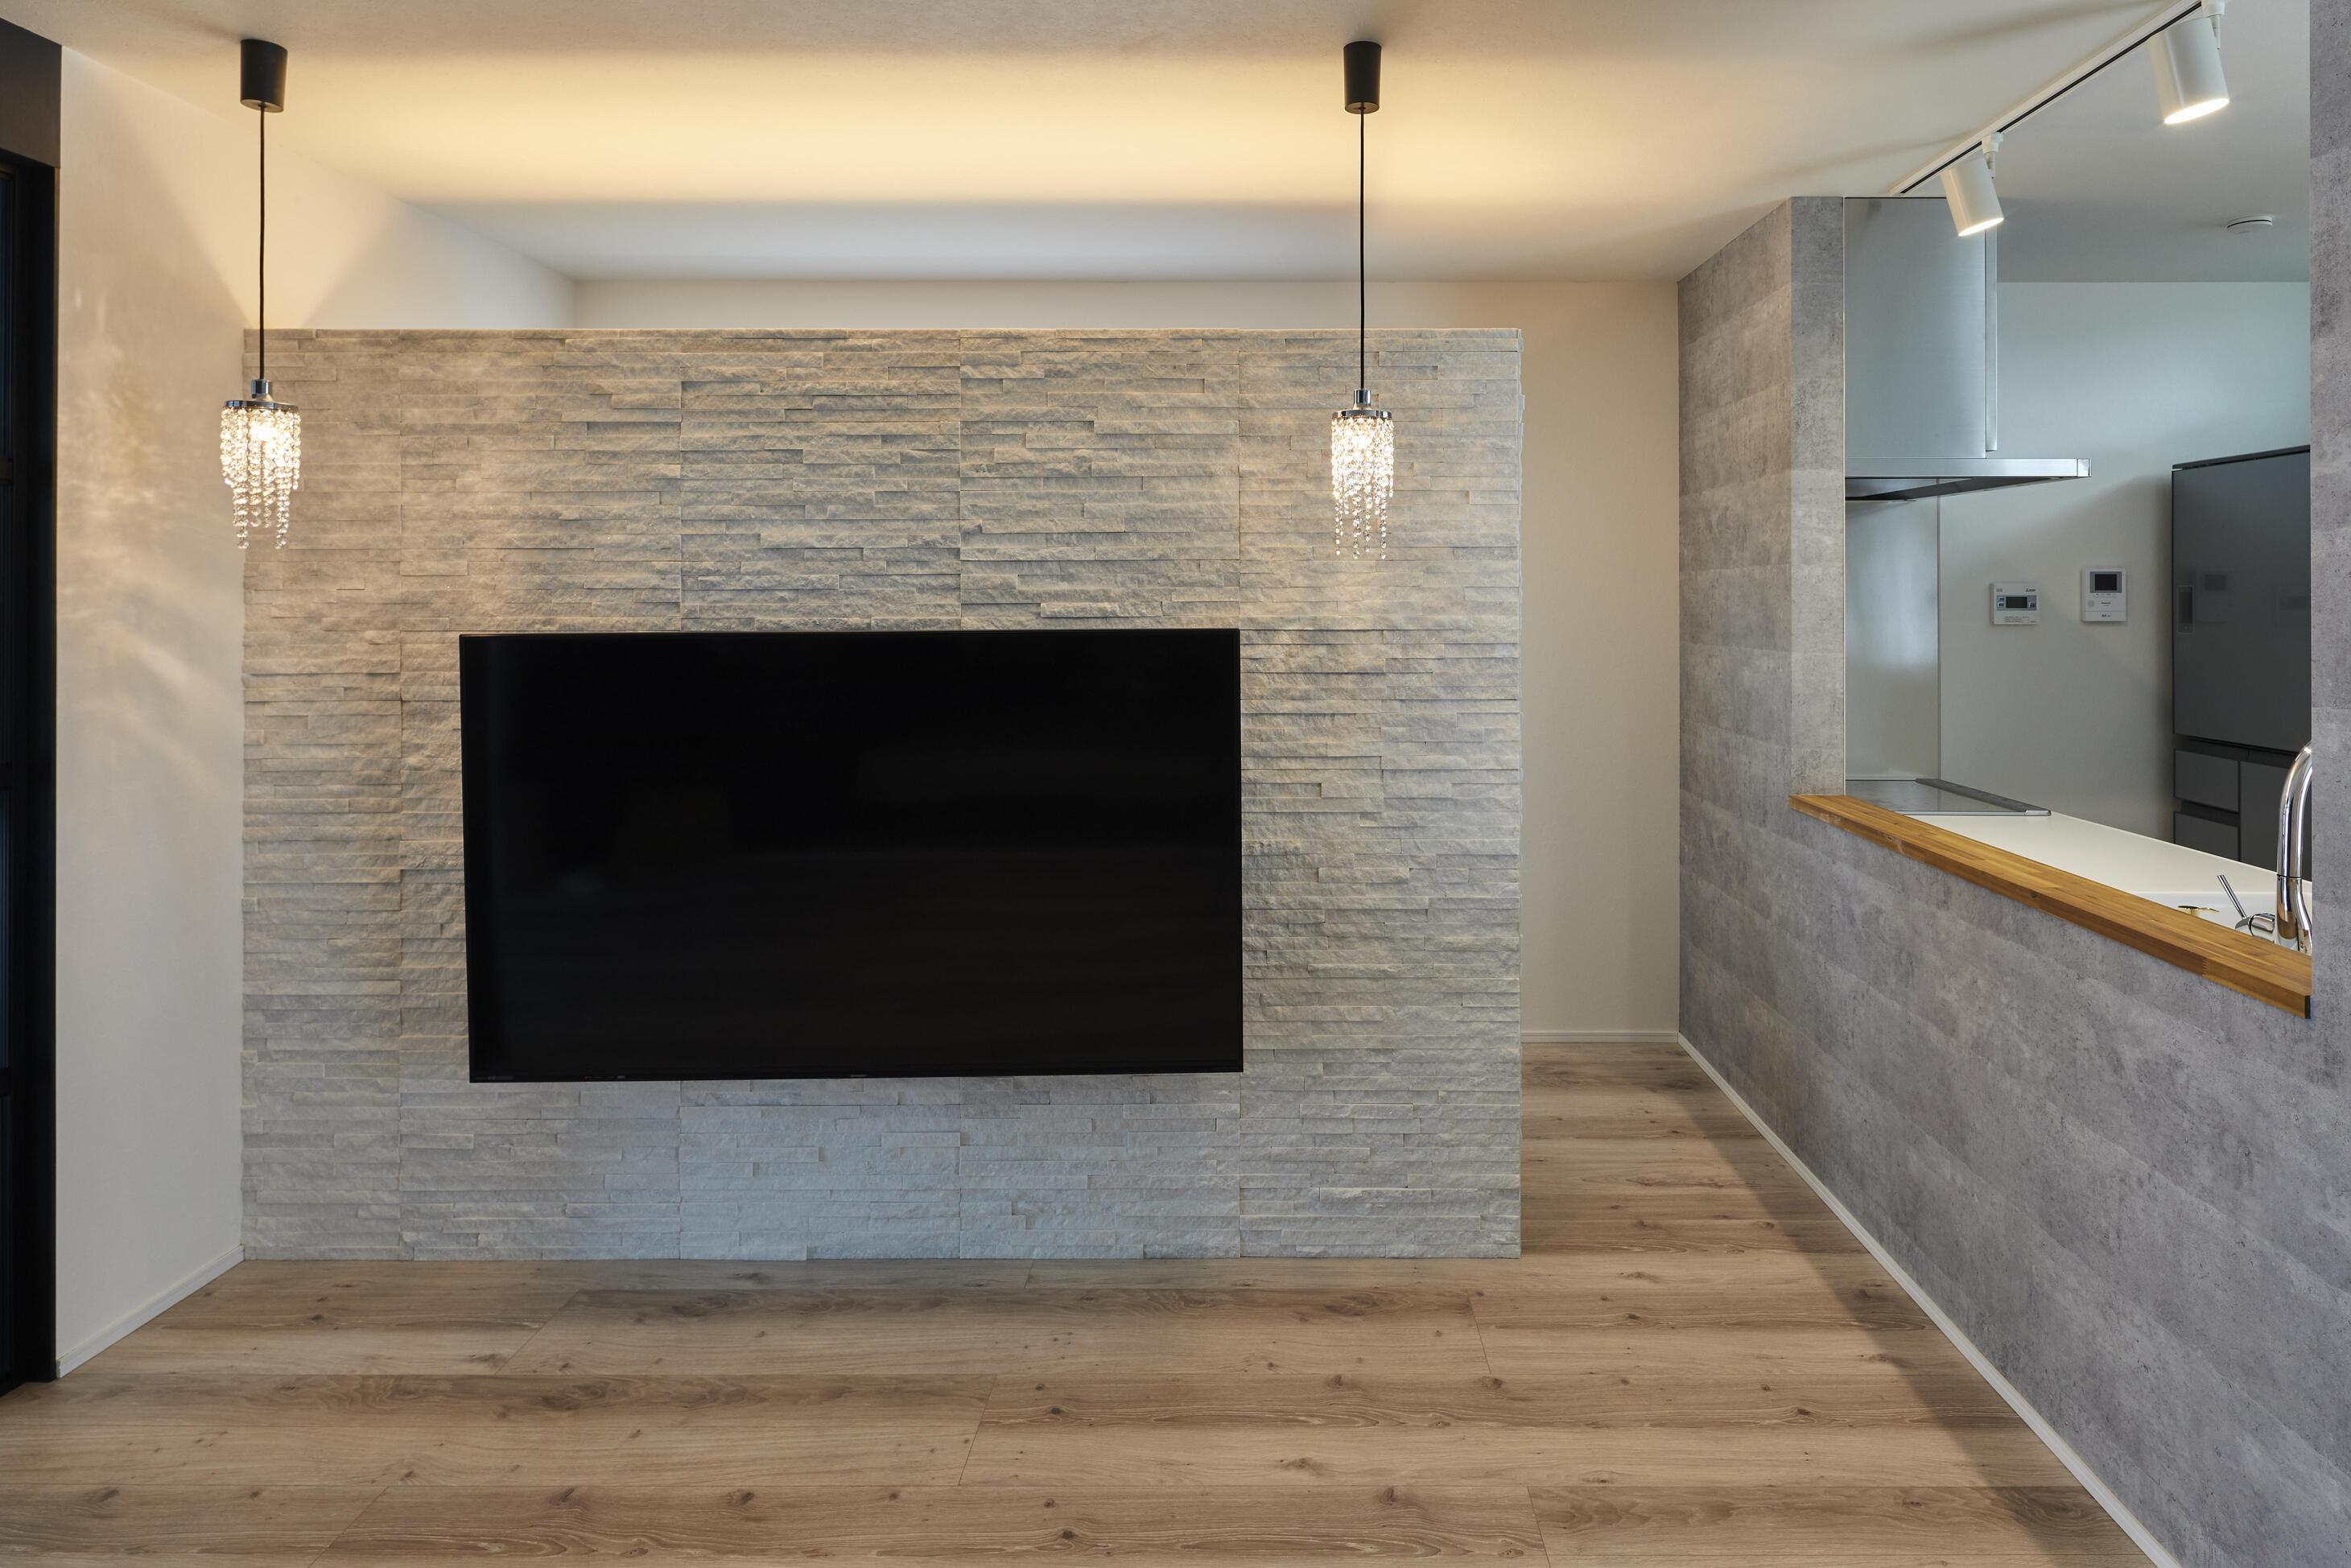 TV背面壁には大理石を使用し、ラグジュアリー感を強調。TV背面壁の後ろにはパントリーを兼ね備えた大きめの収納スペースを設計している